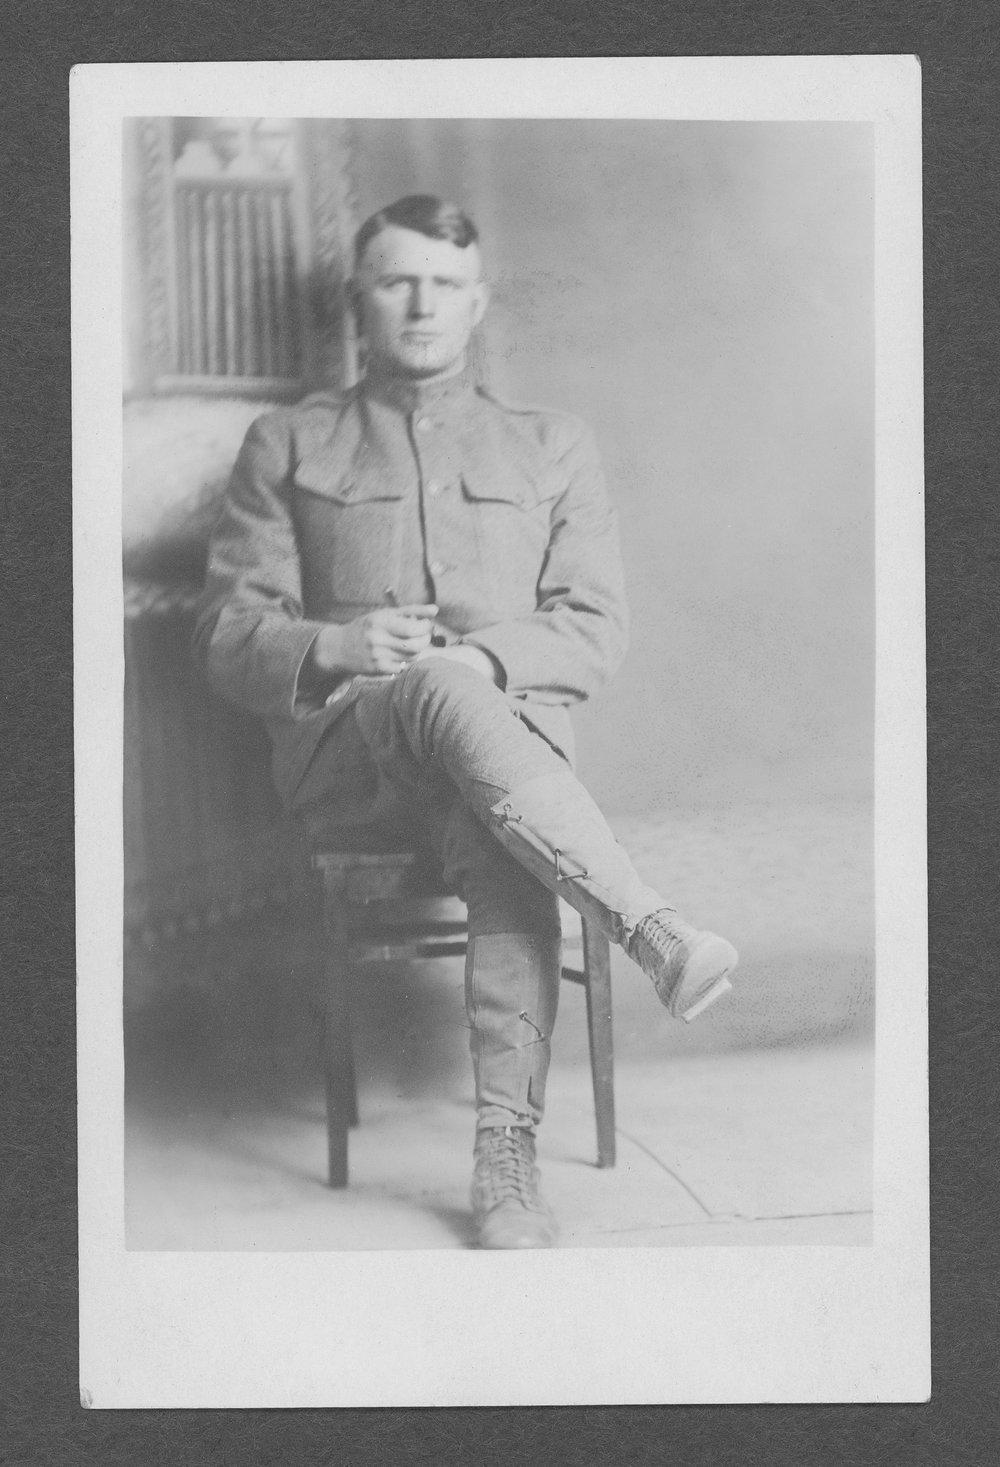 Carl Lester Cavenee, World War I soldier - 1